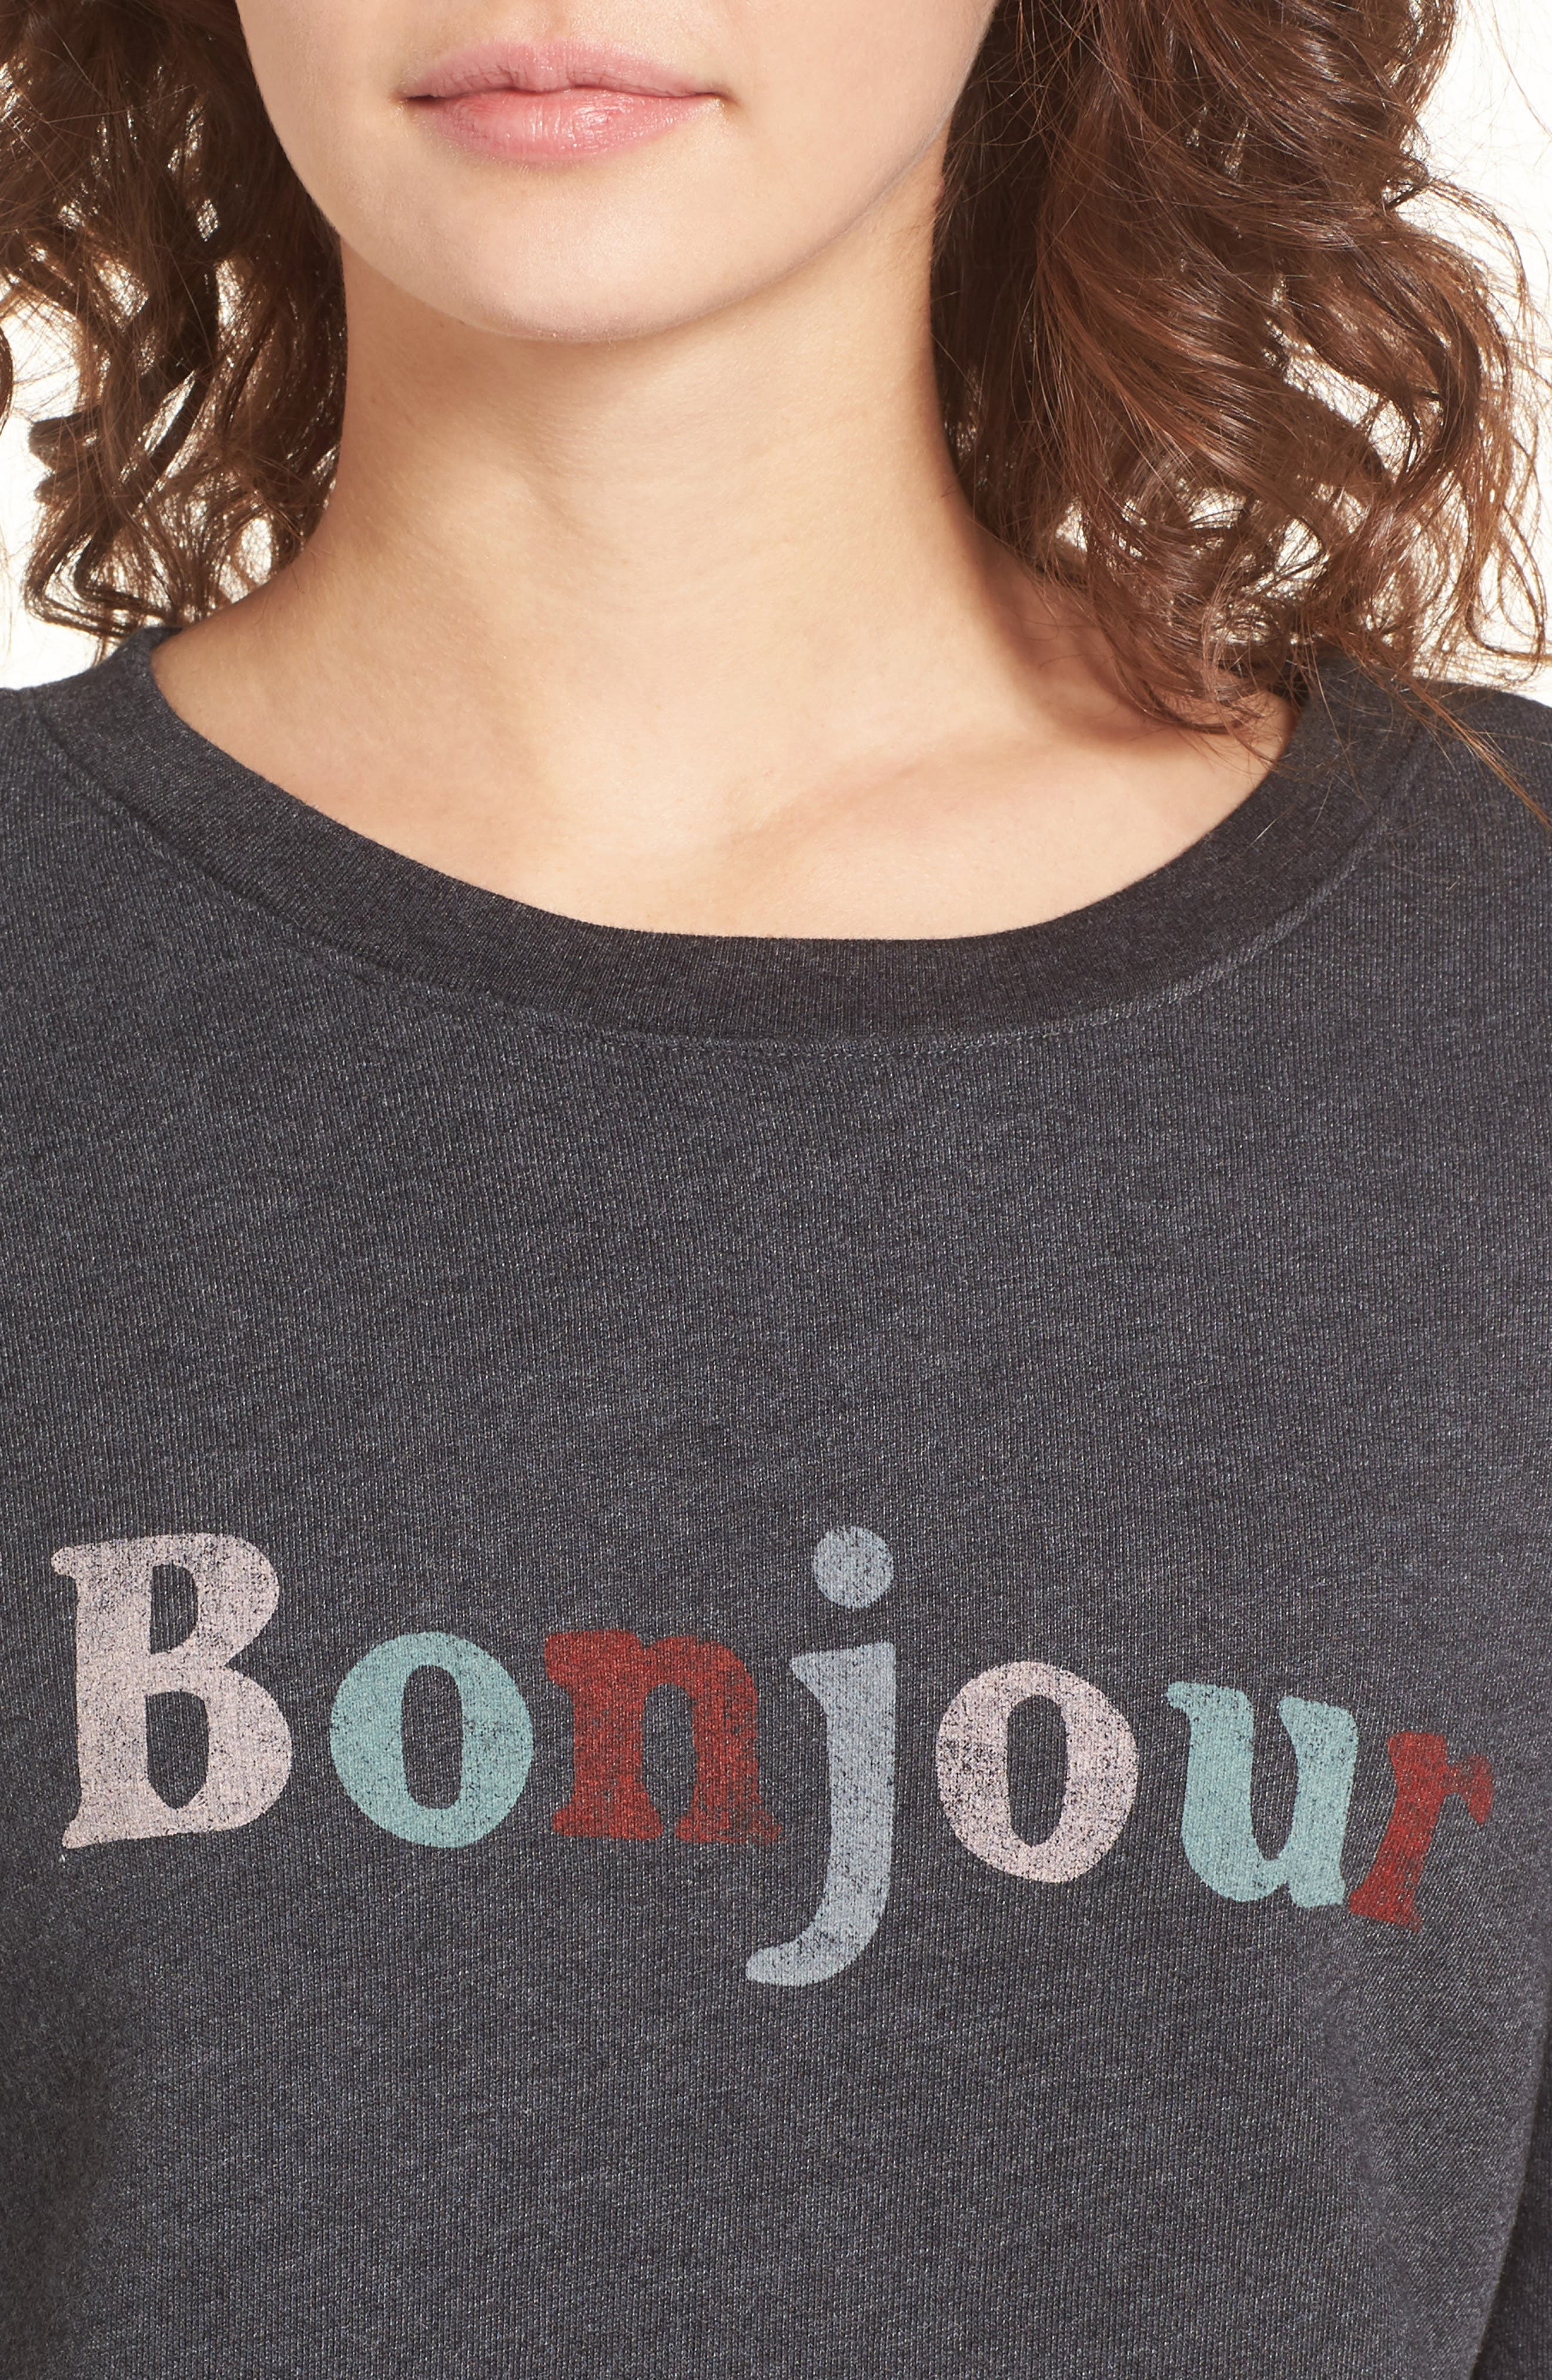 Bonjour Sweatshirt,                             Alternate thumbnail 4, color,                             Faded Black